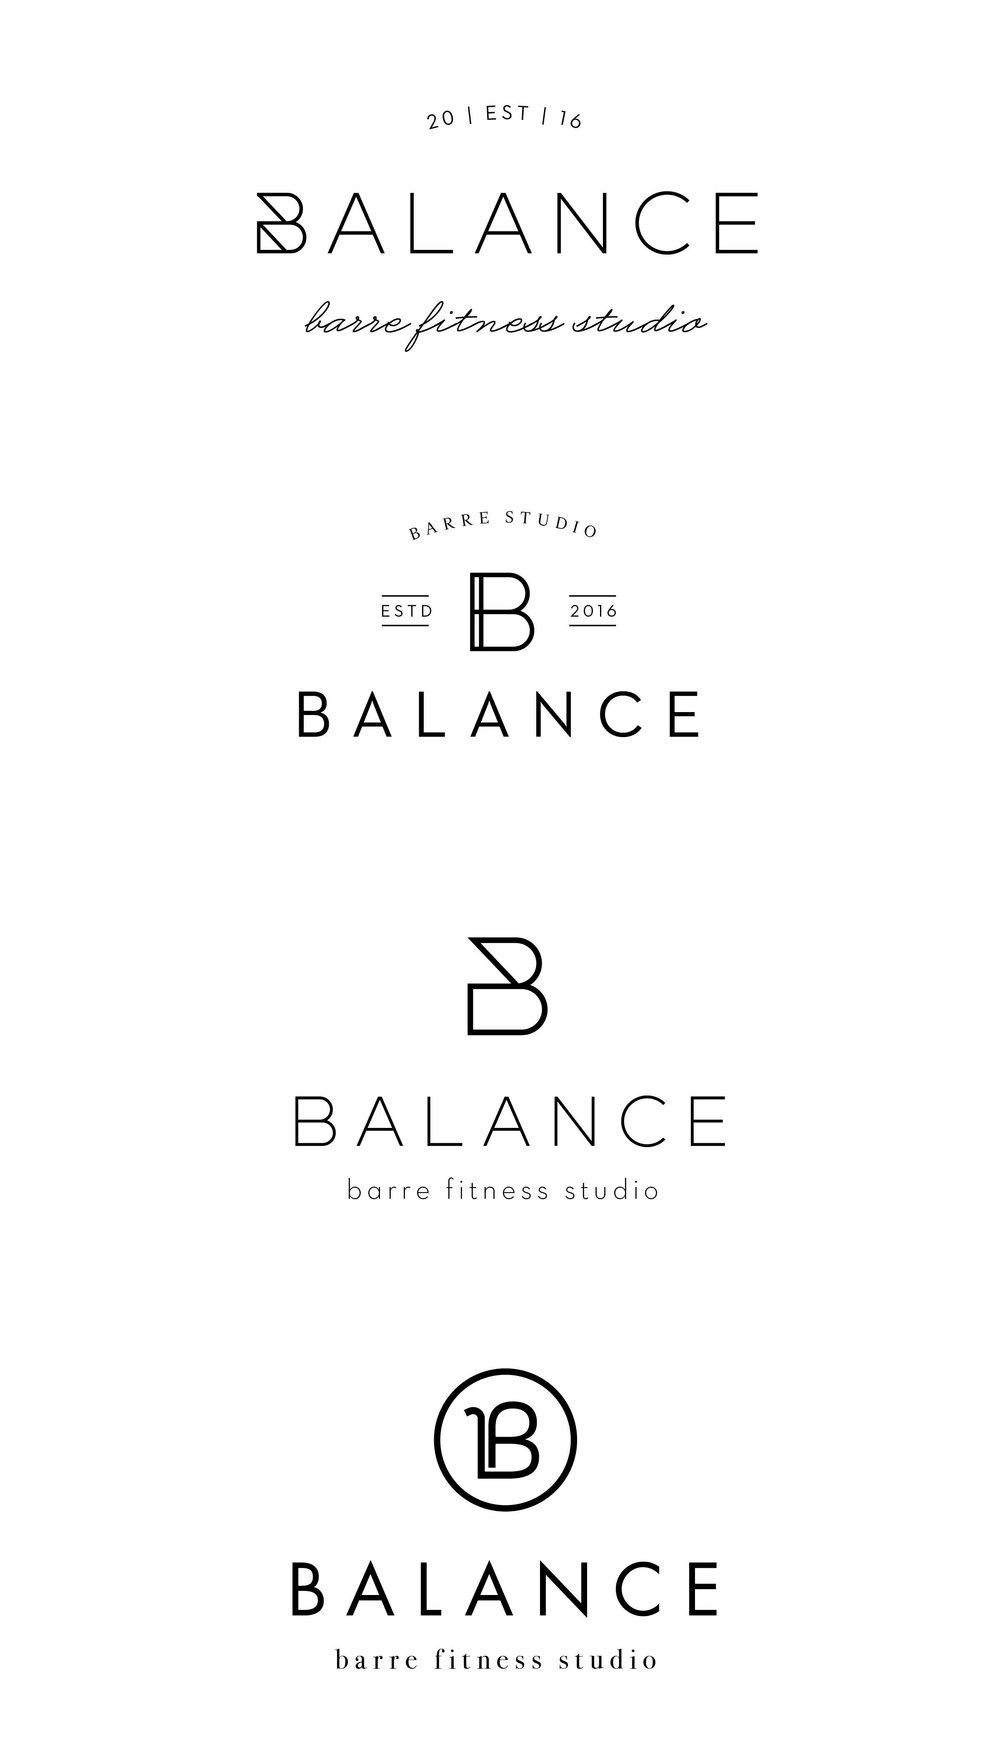 balance_concepts.jpg